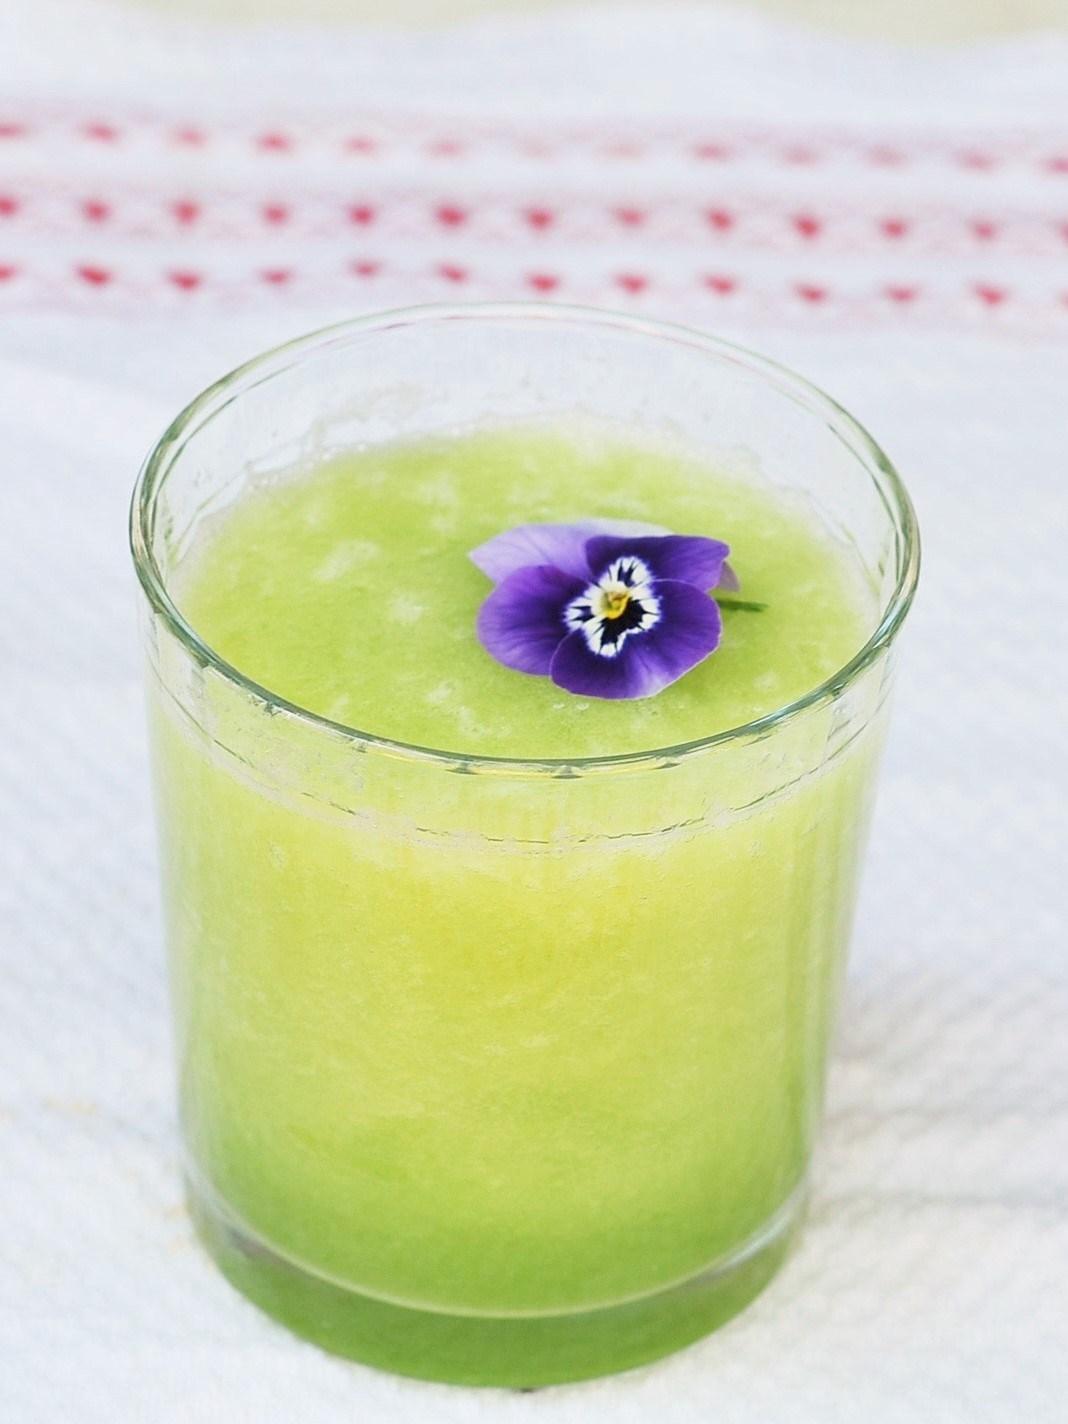 Honeydew-melon-juice-Kiku-Corner-2